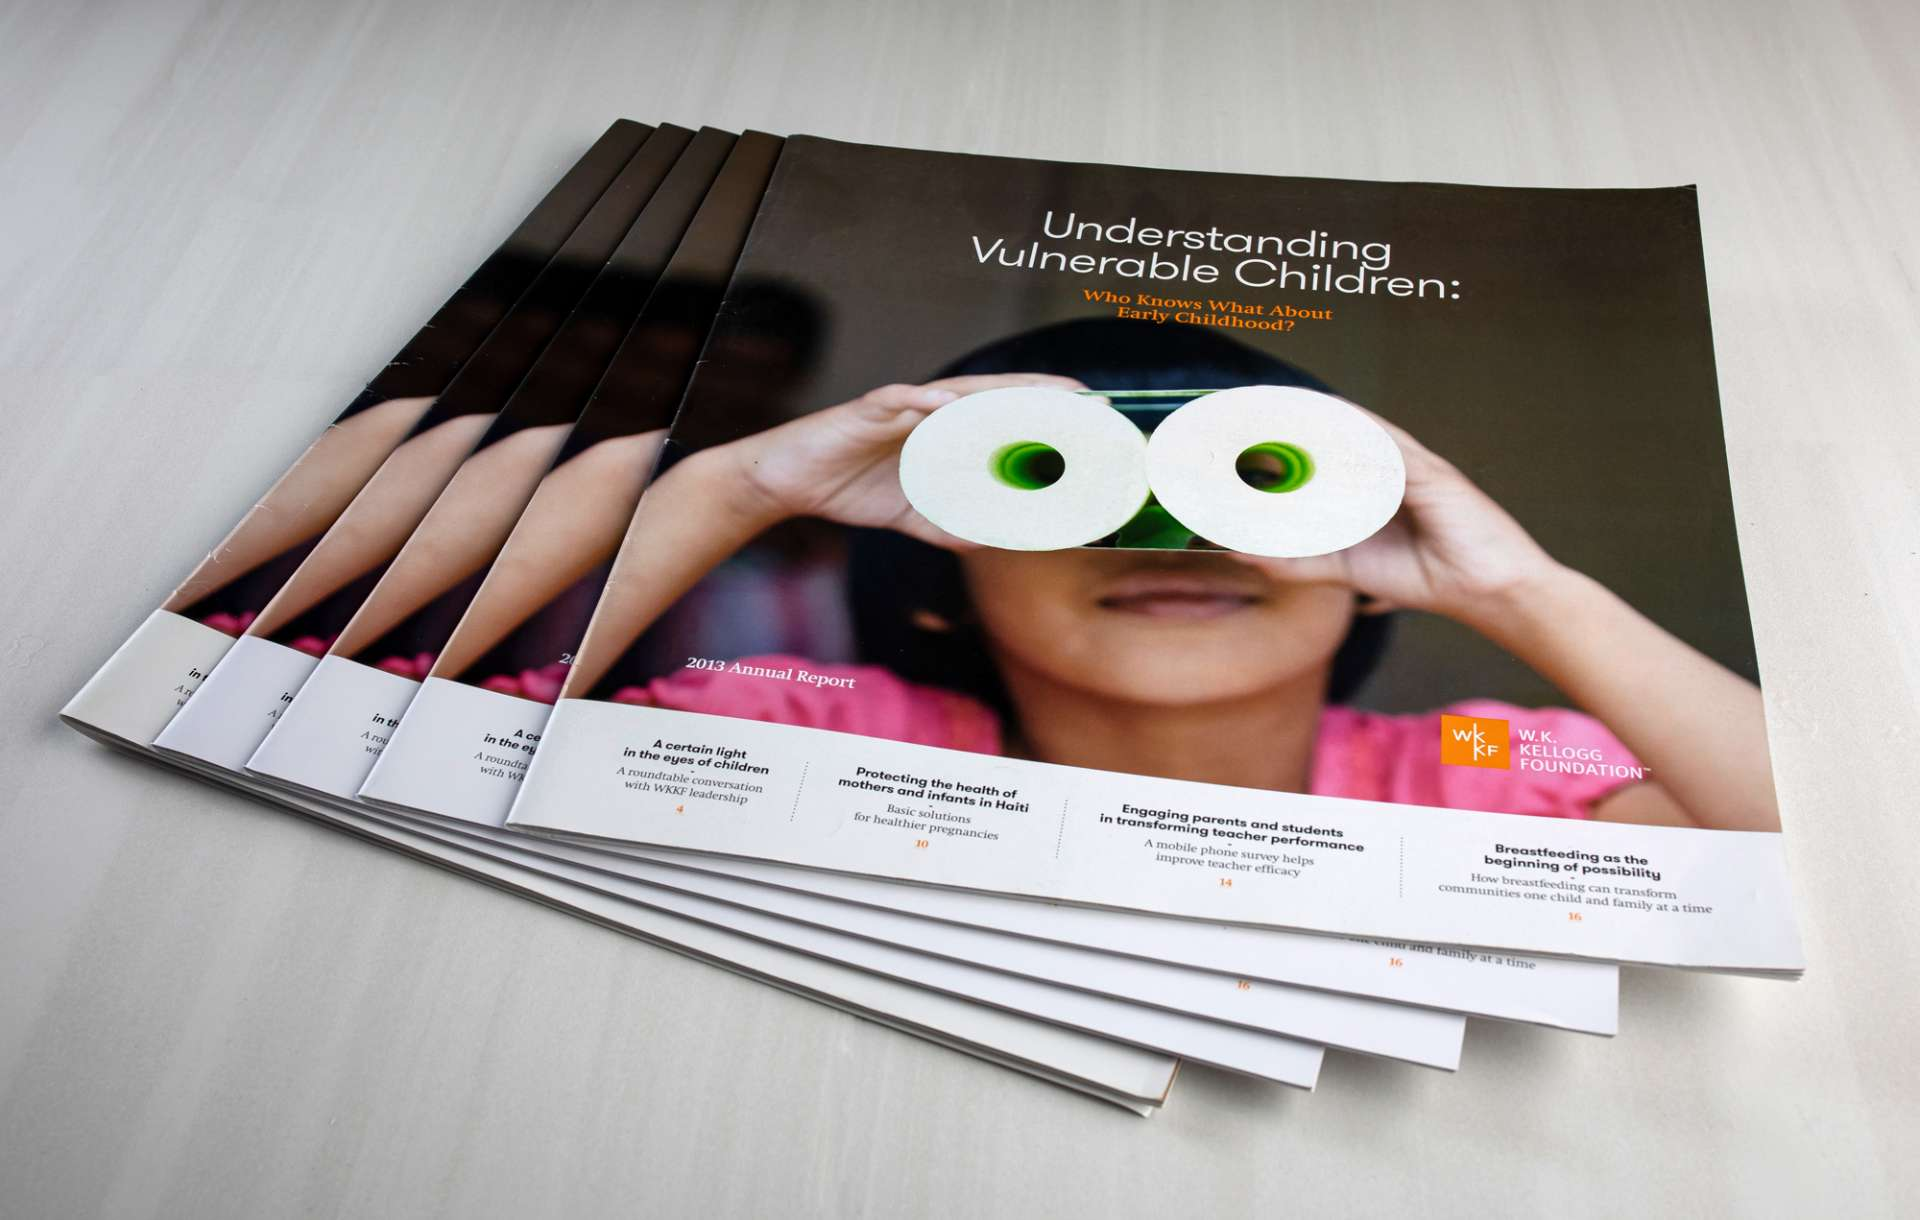 WK Kellogg Foundation Annual Reports